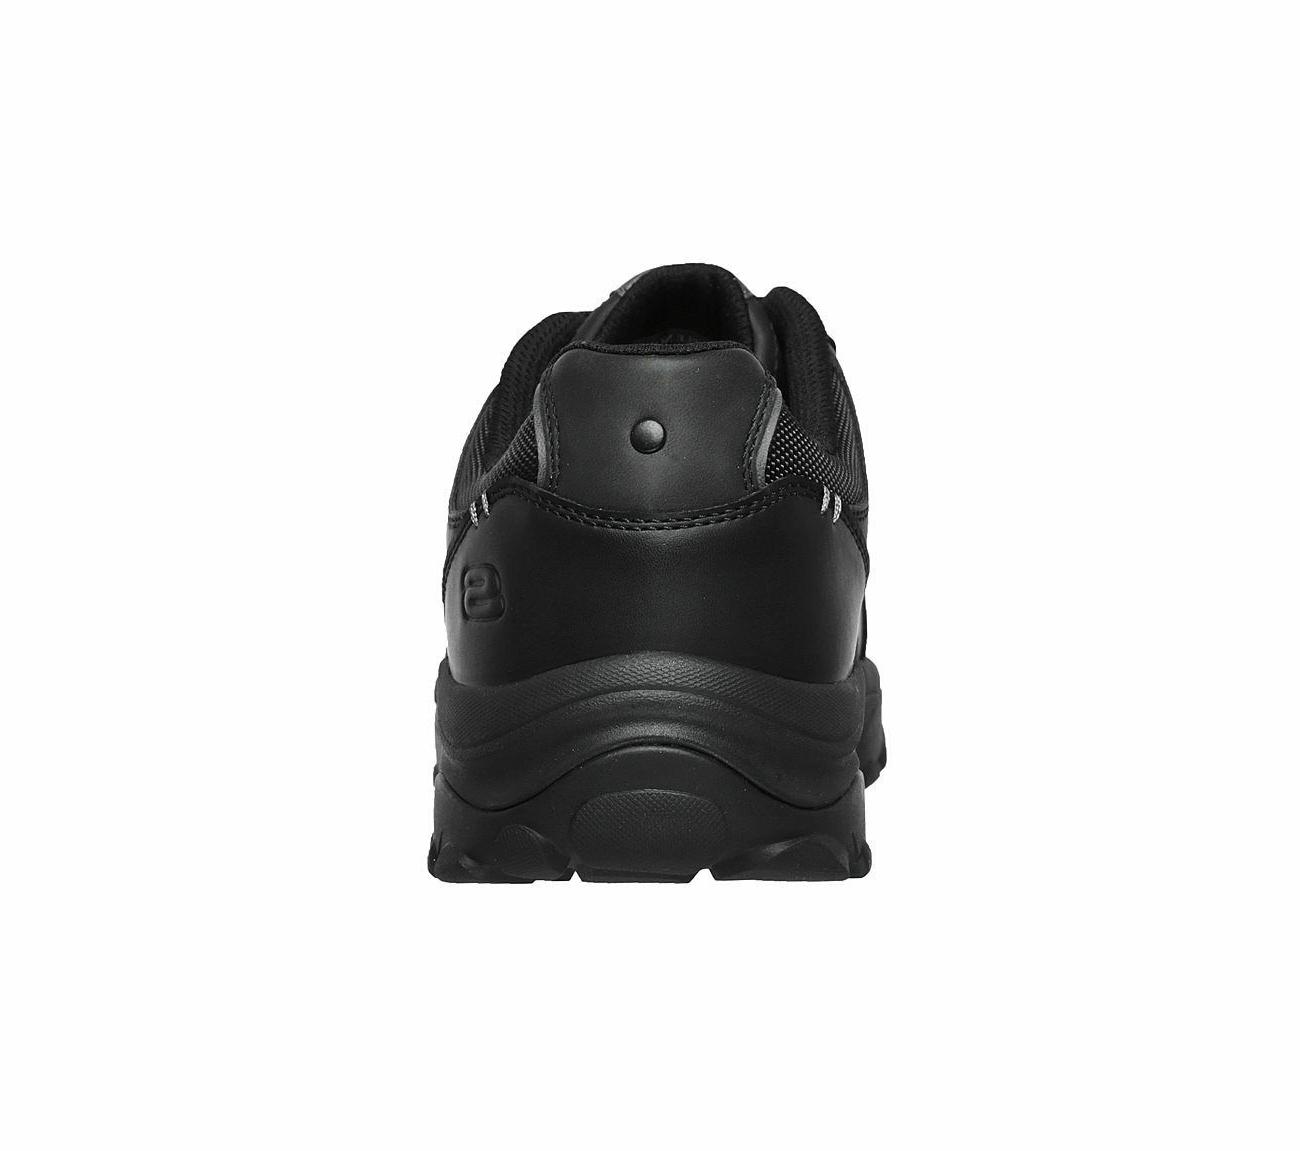 Skechers shoes Men Memory Foam Sporty Casual Comfort Leather